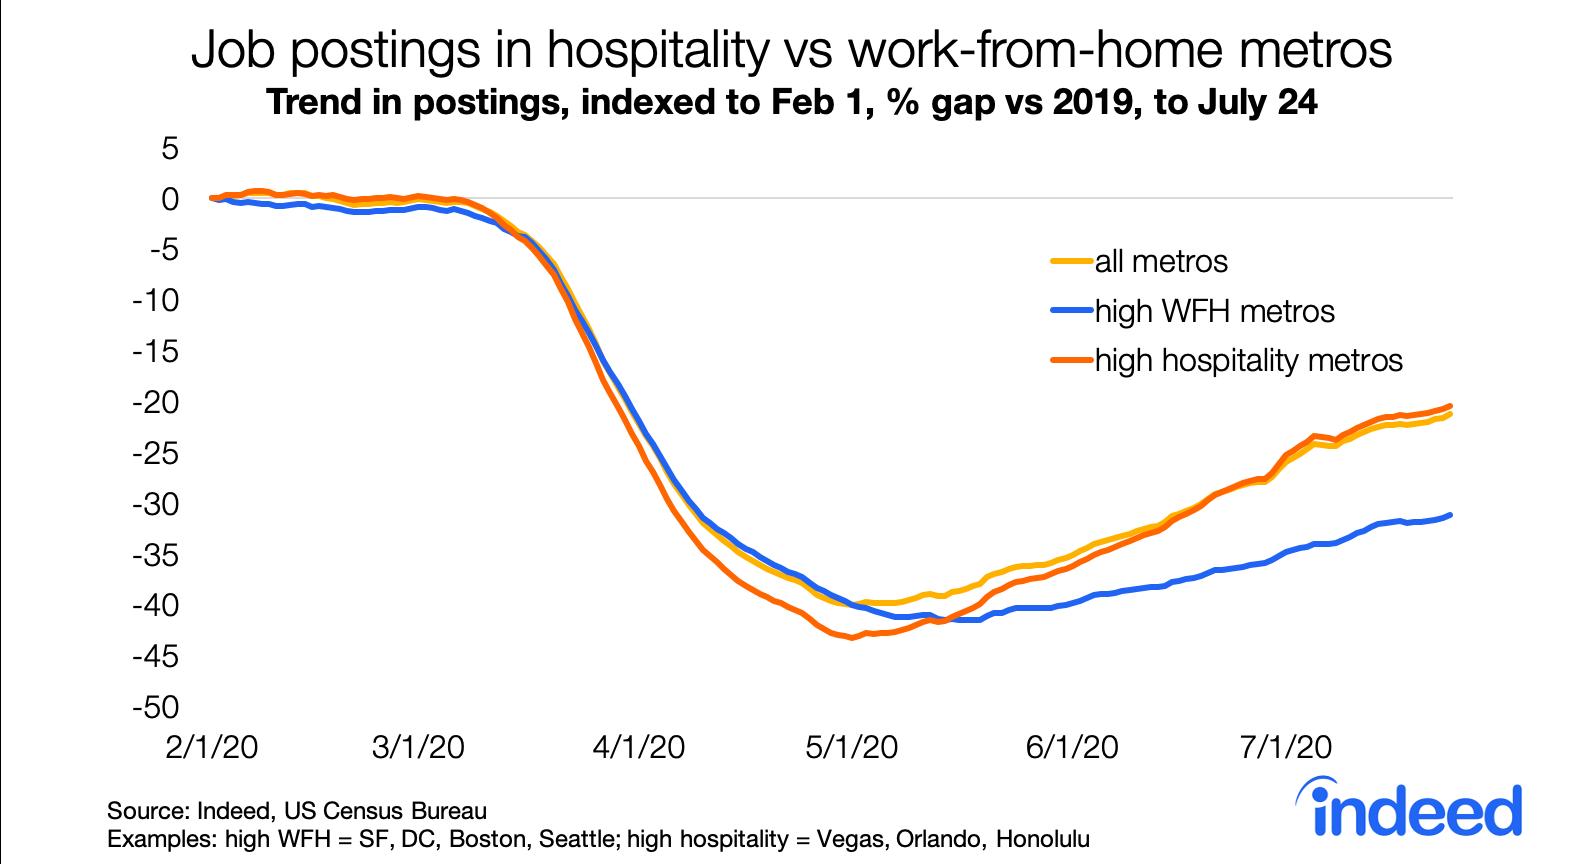 Job postings in hospitality vs. work from home metros